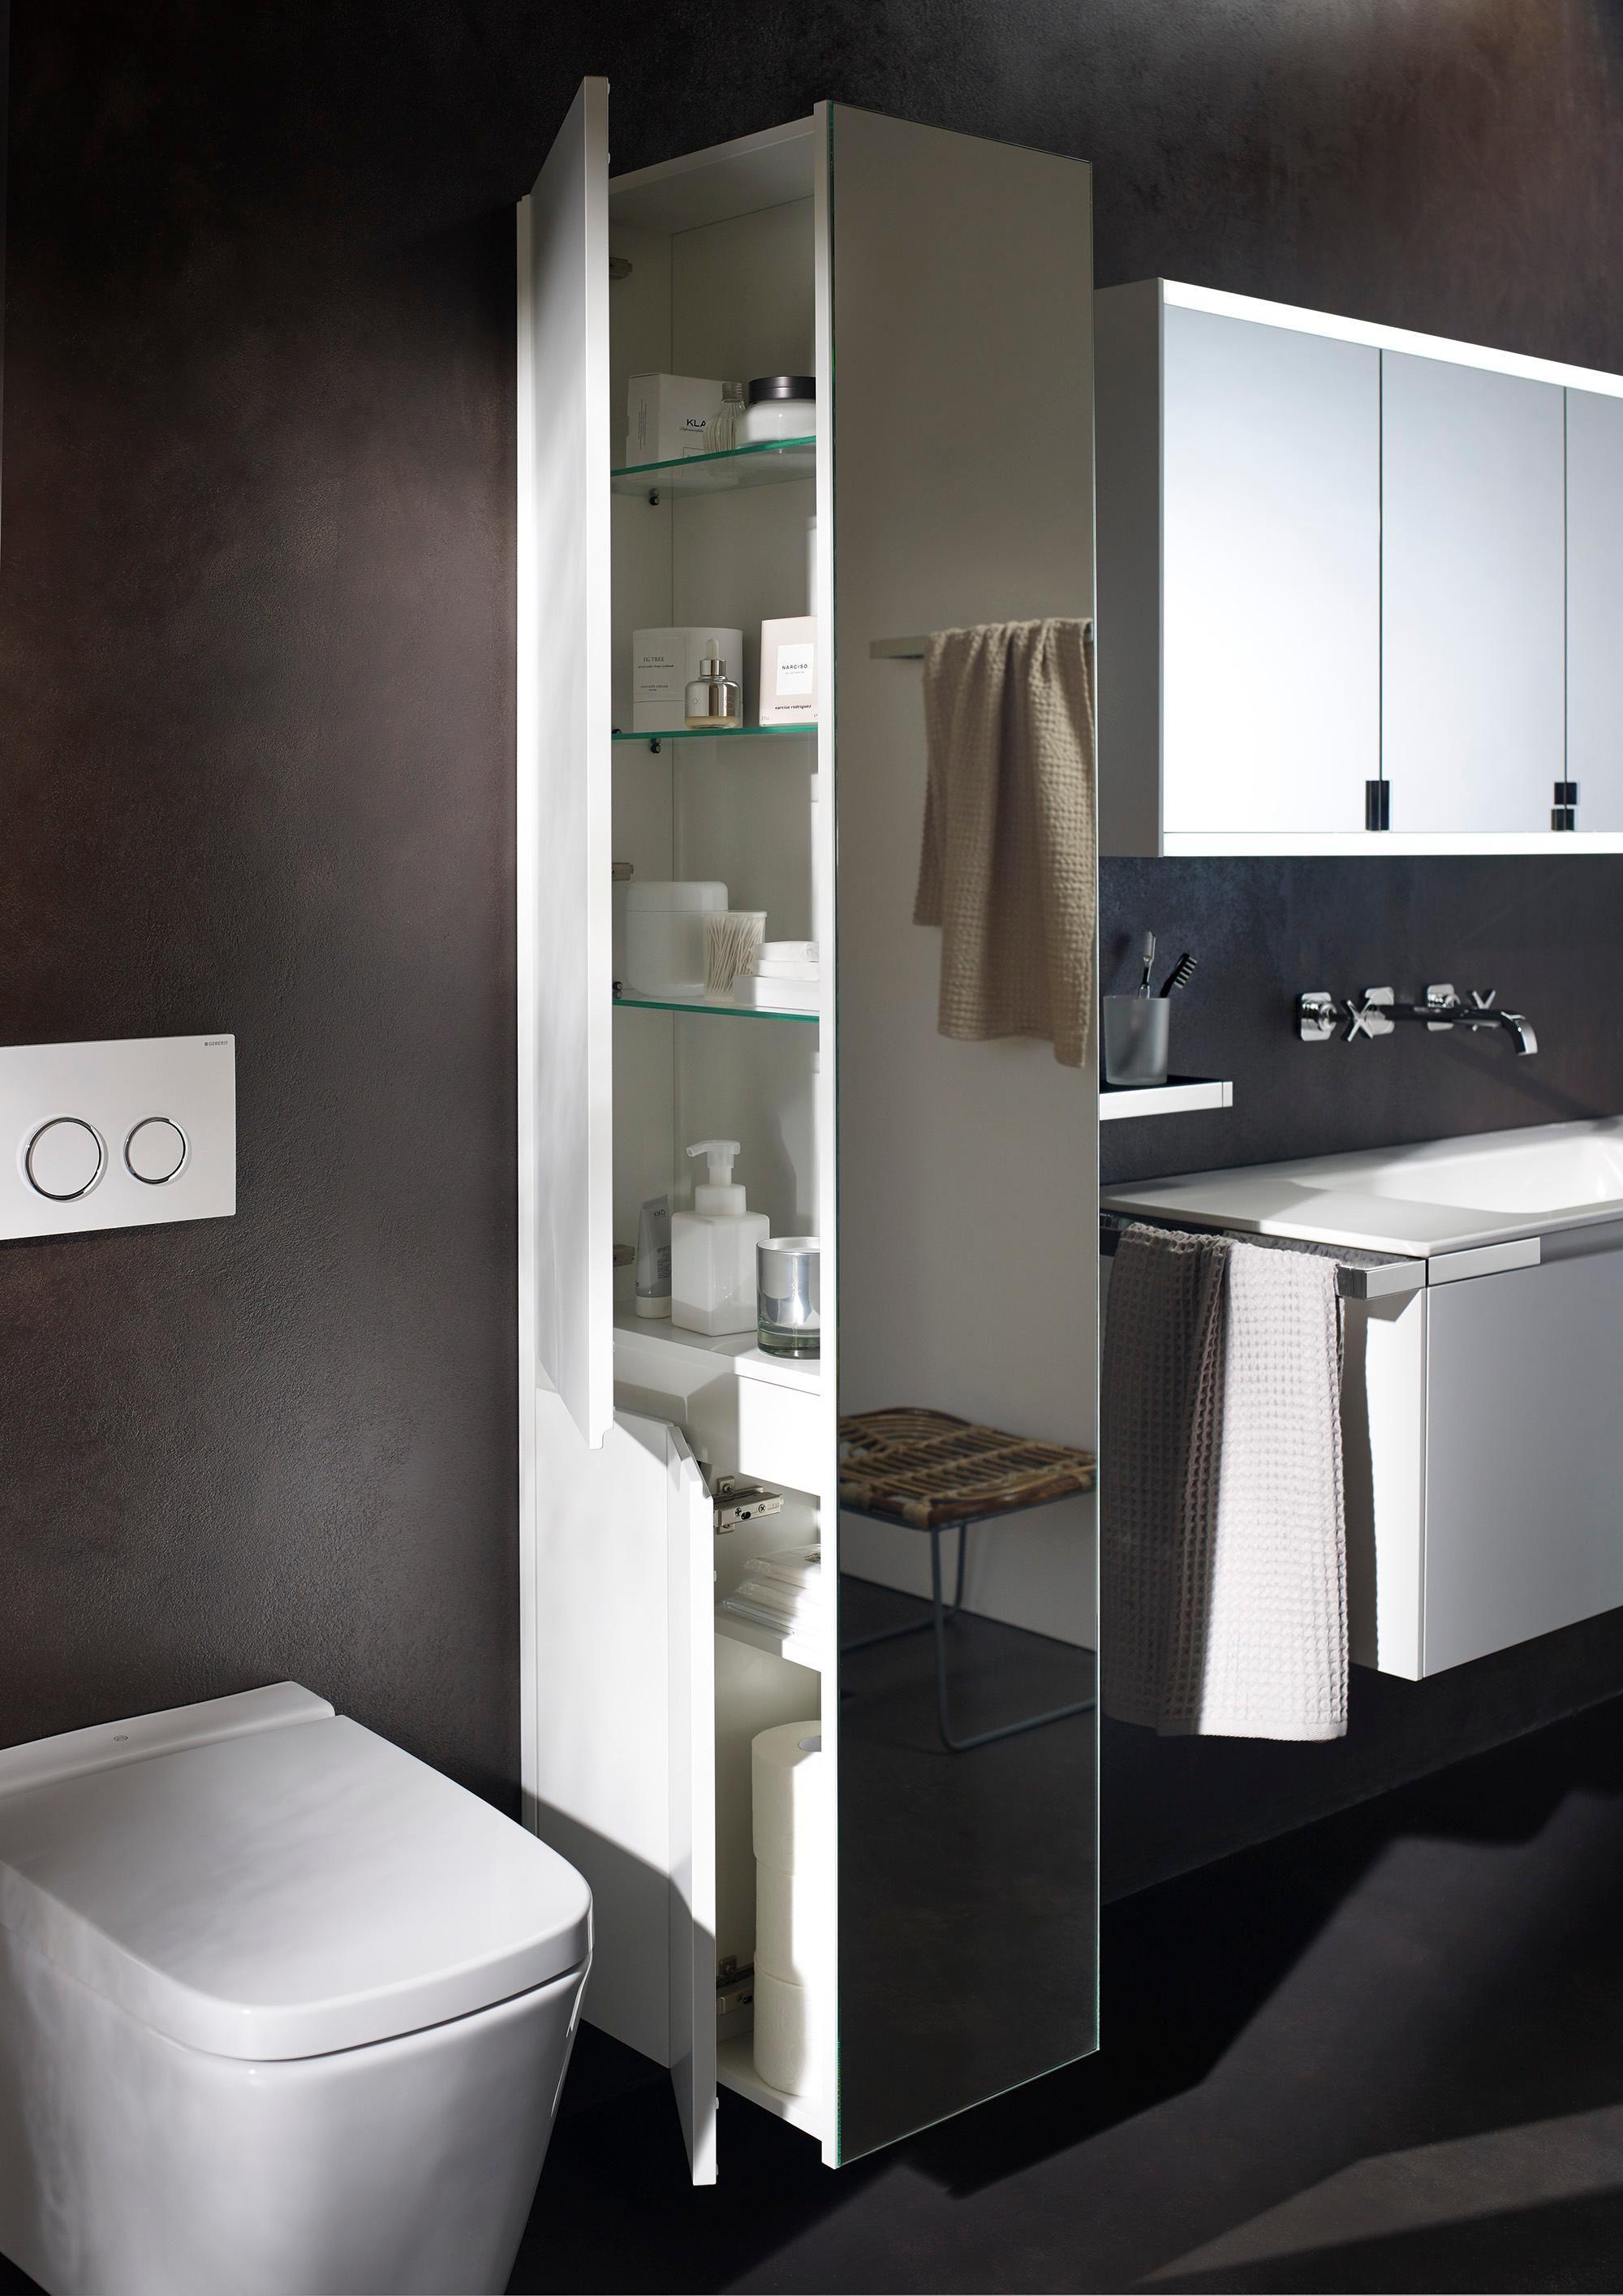 Billig Raumteiler Bad Raumteiler Bad Badezimmerideen